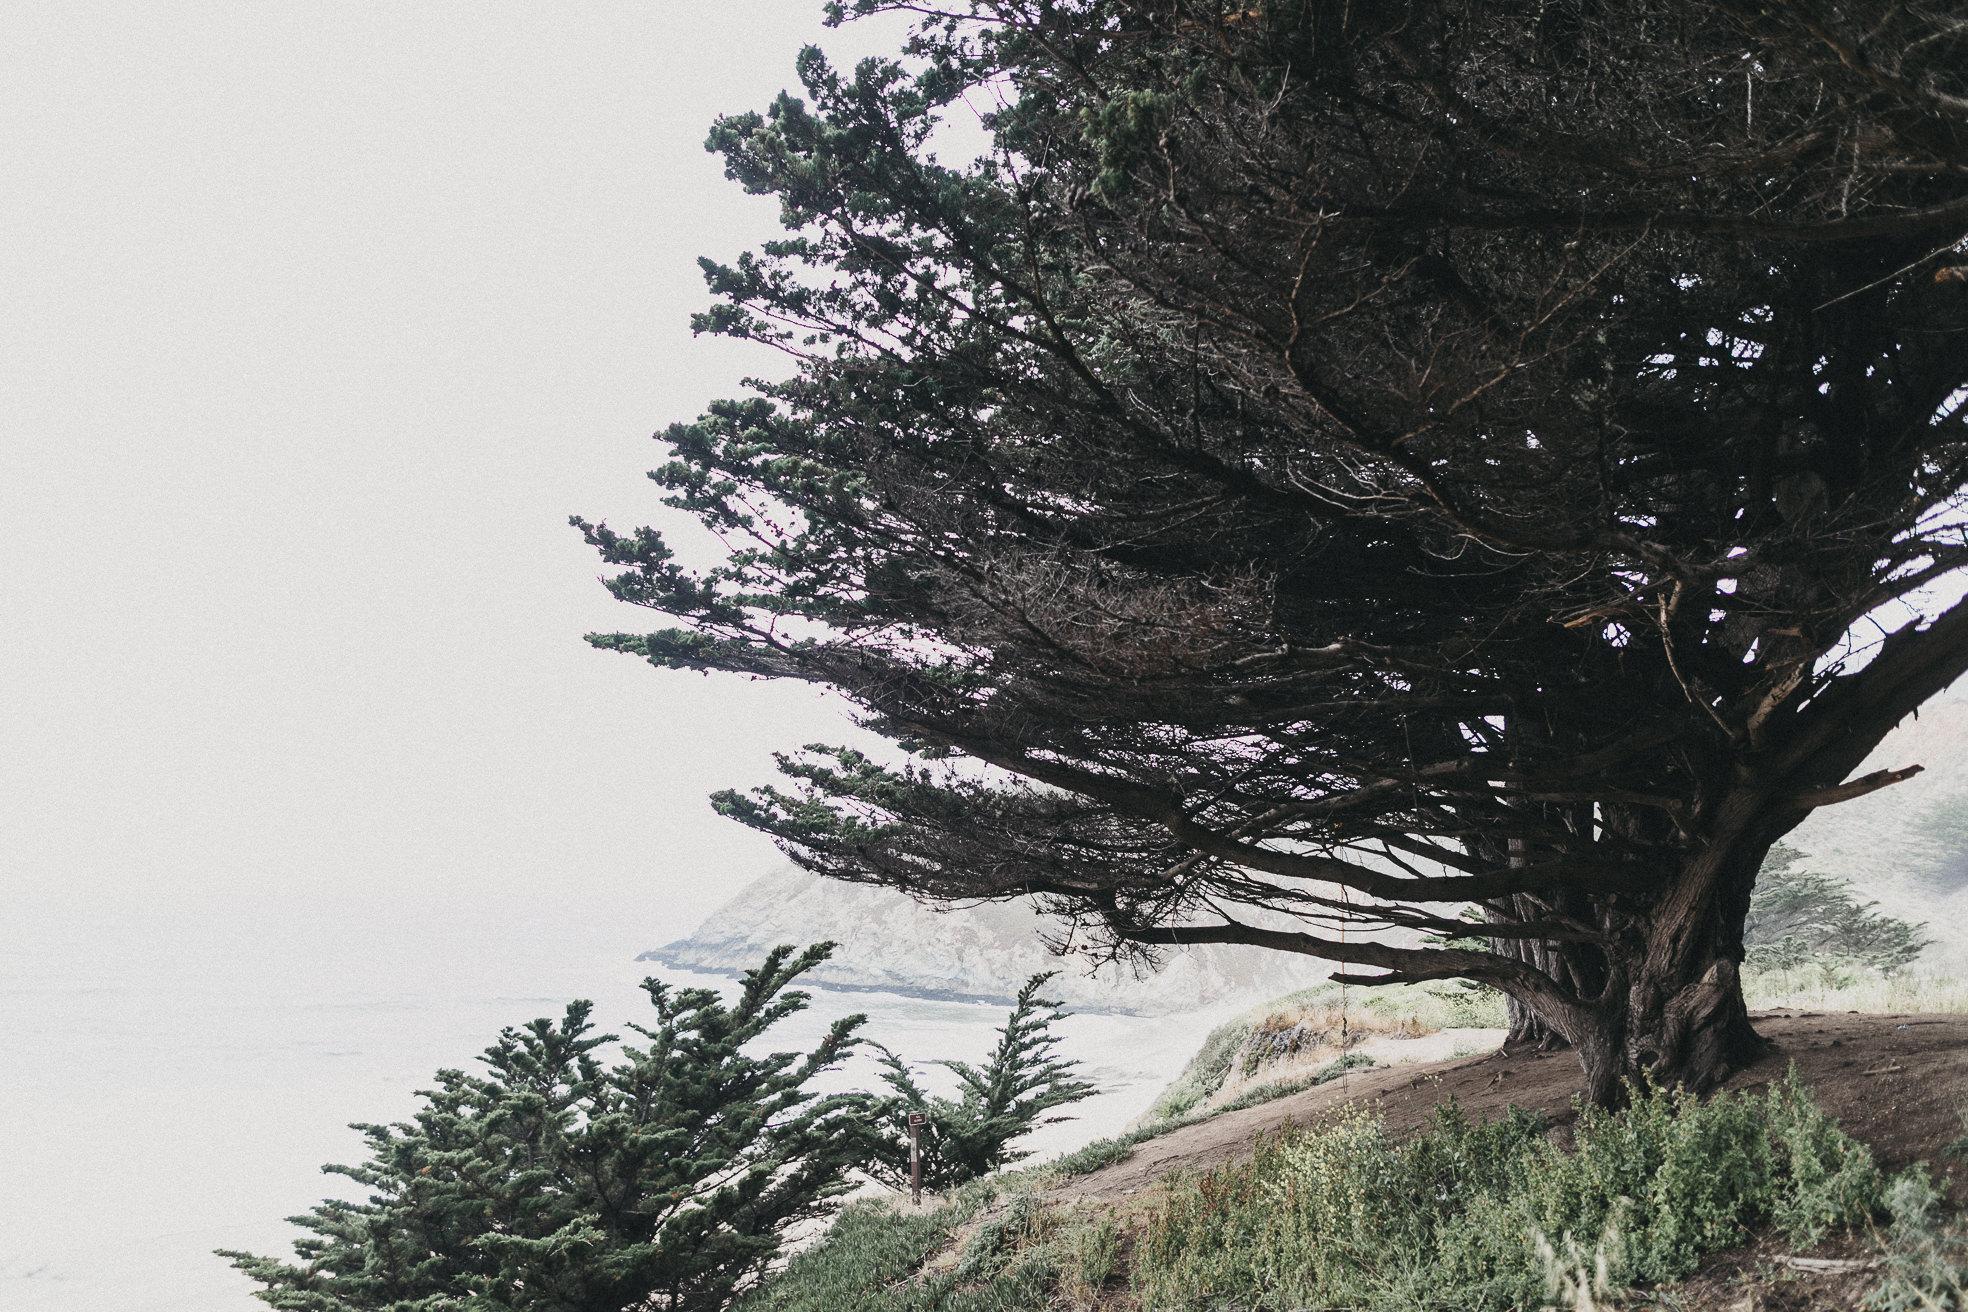 San-Francisco-BildervomLeben-9896